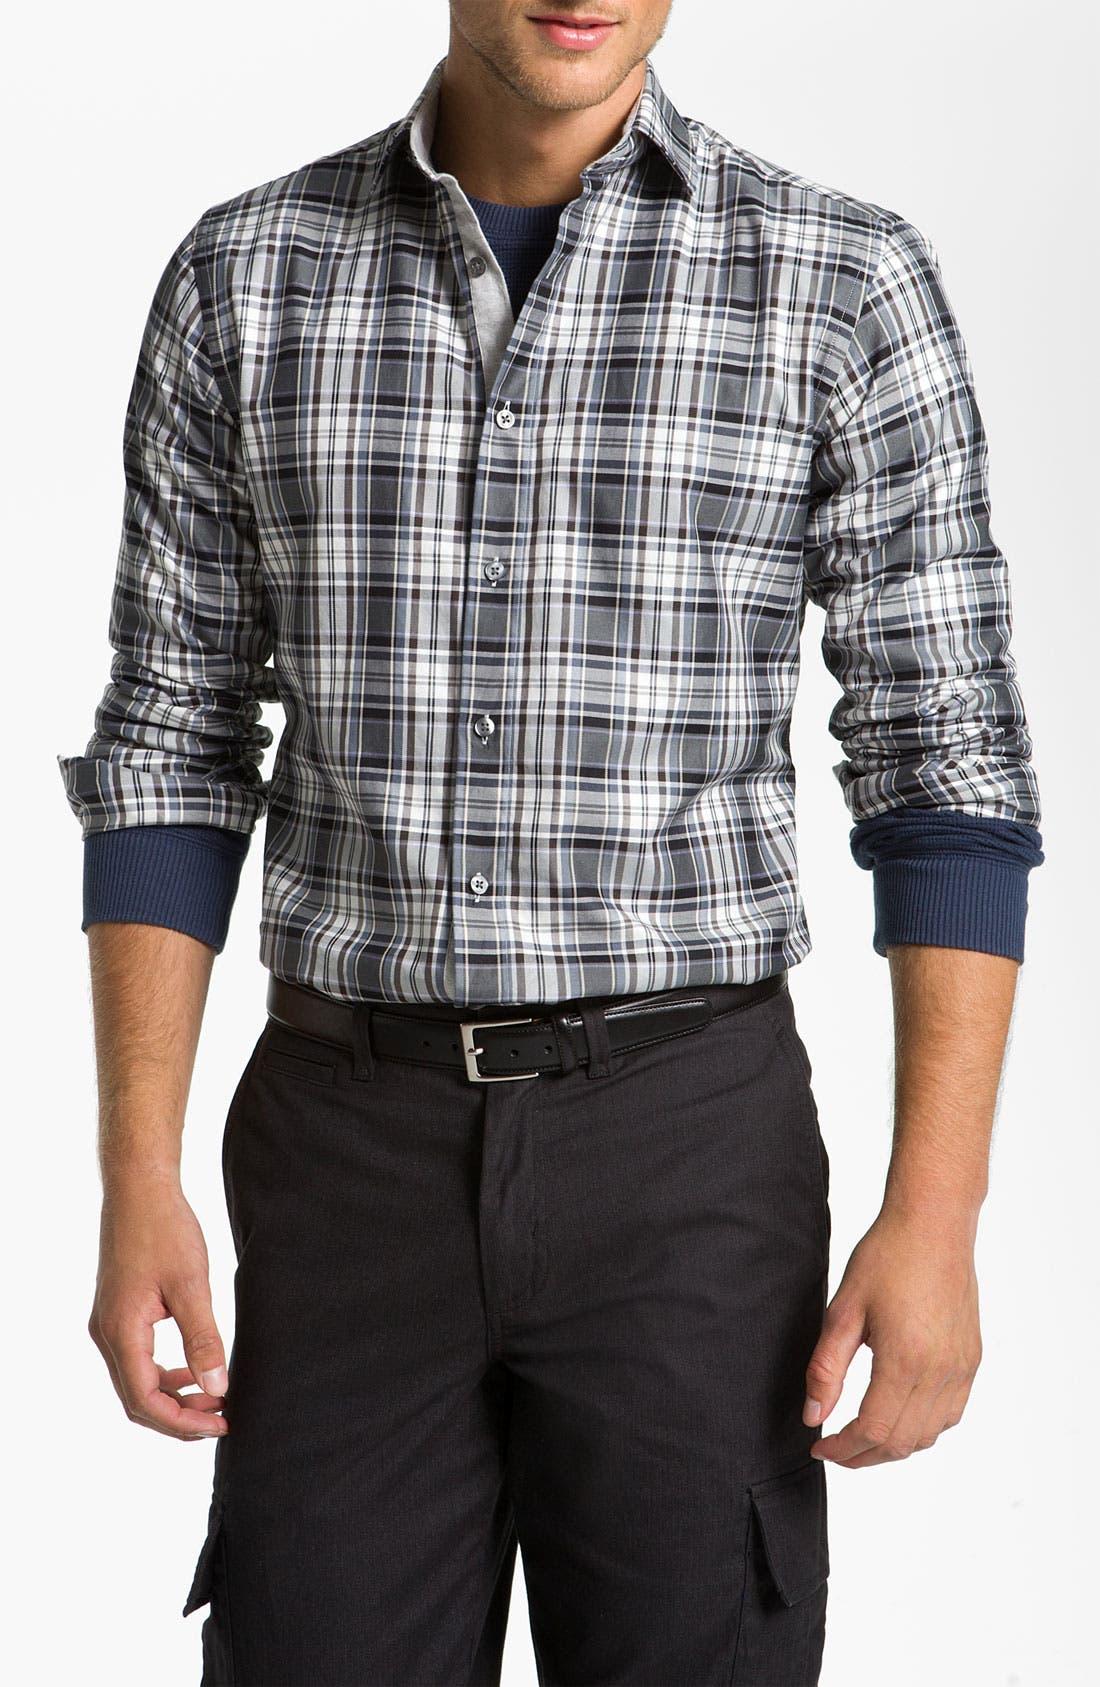 Alternate Image 1 Selected - Hickey Freeman Plaid Sport Shirt